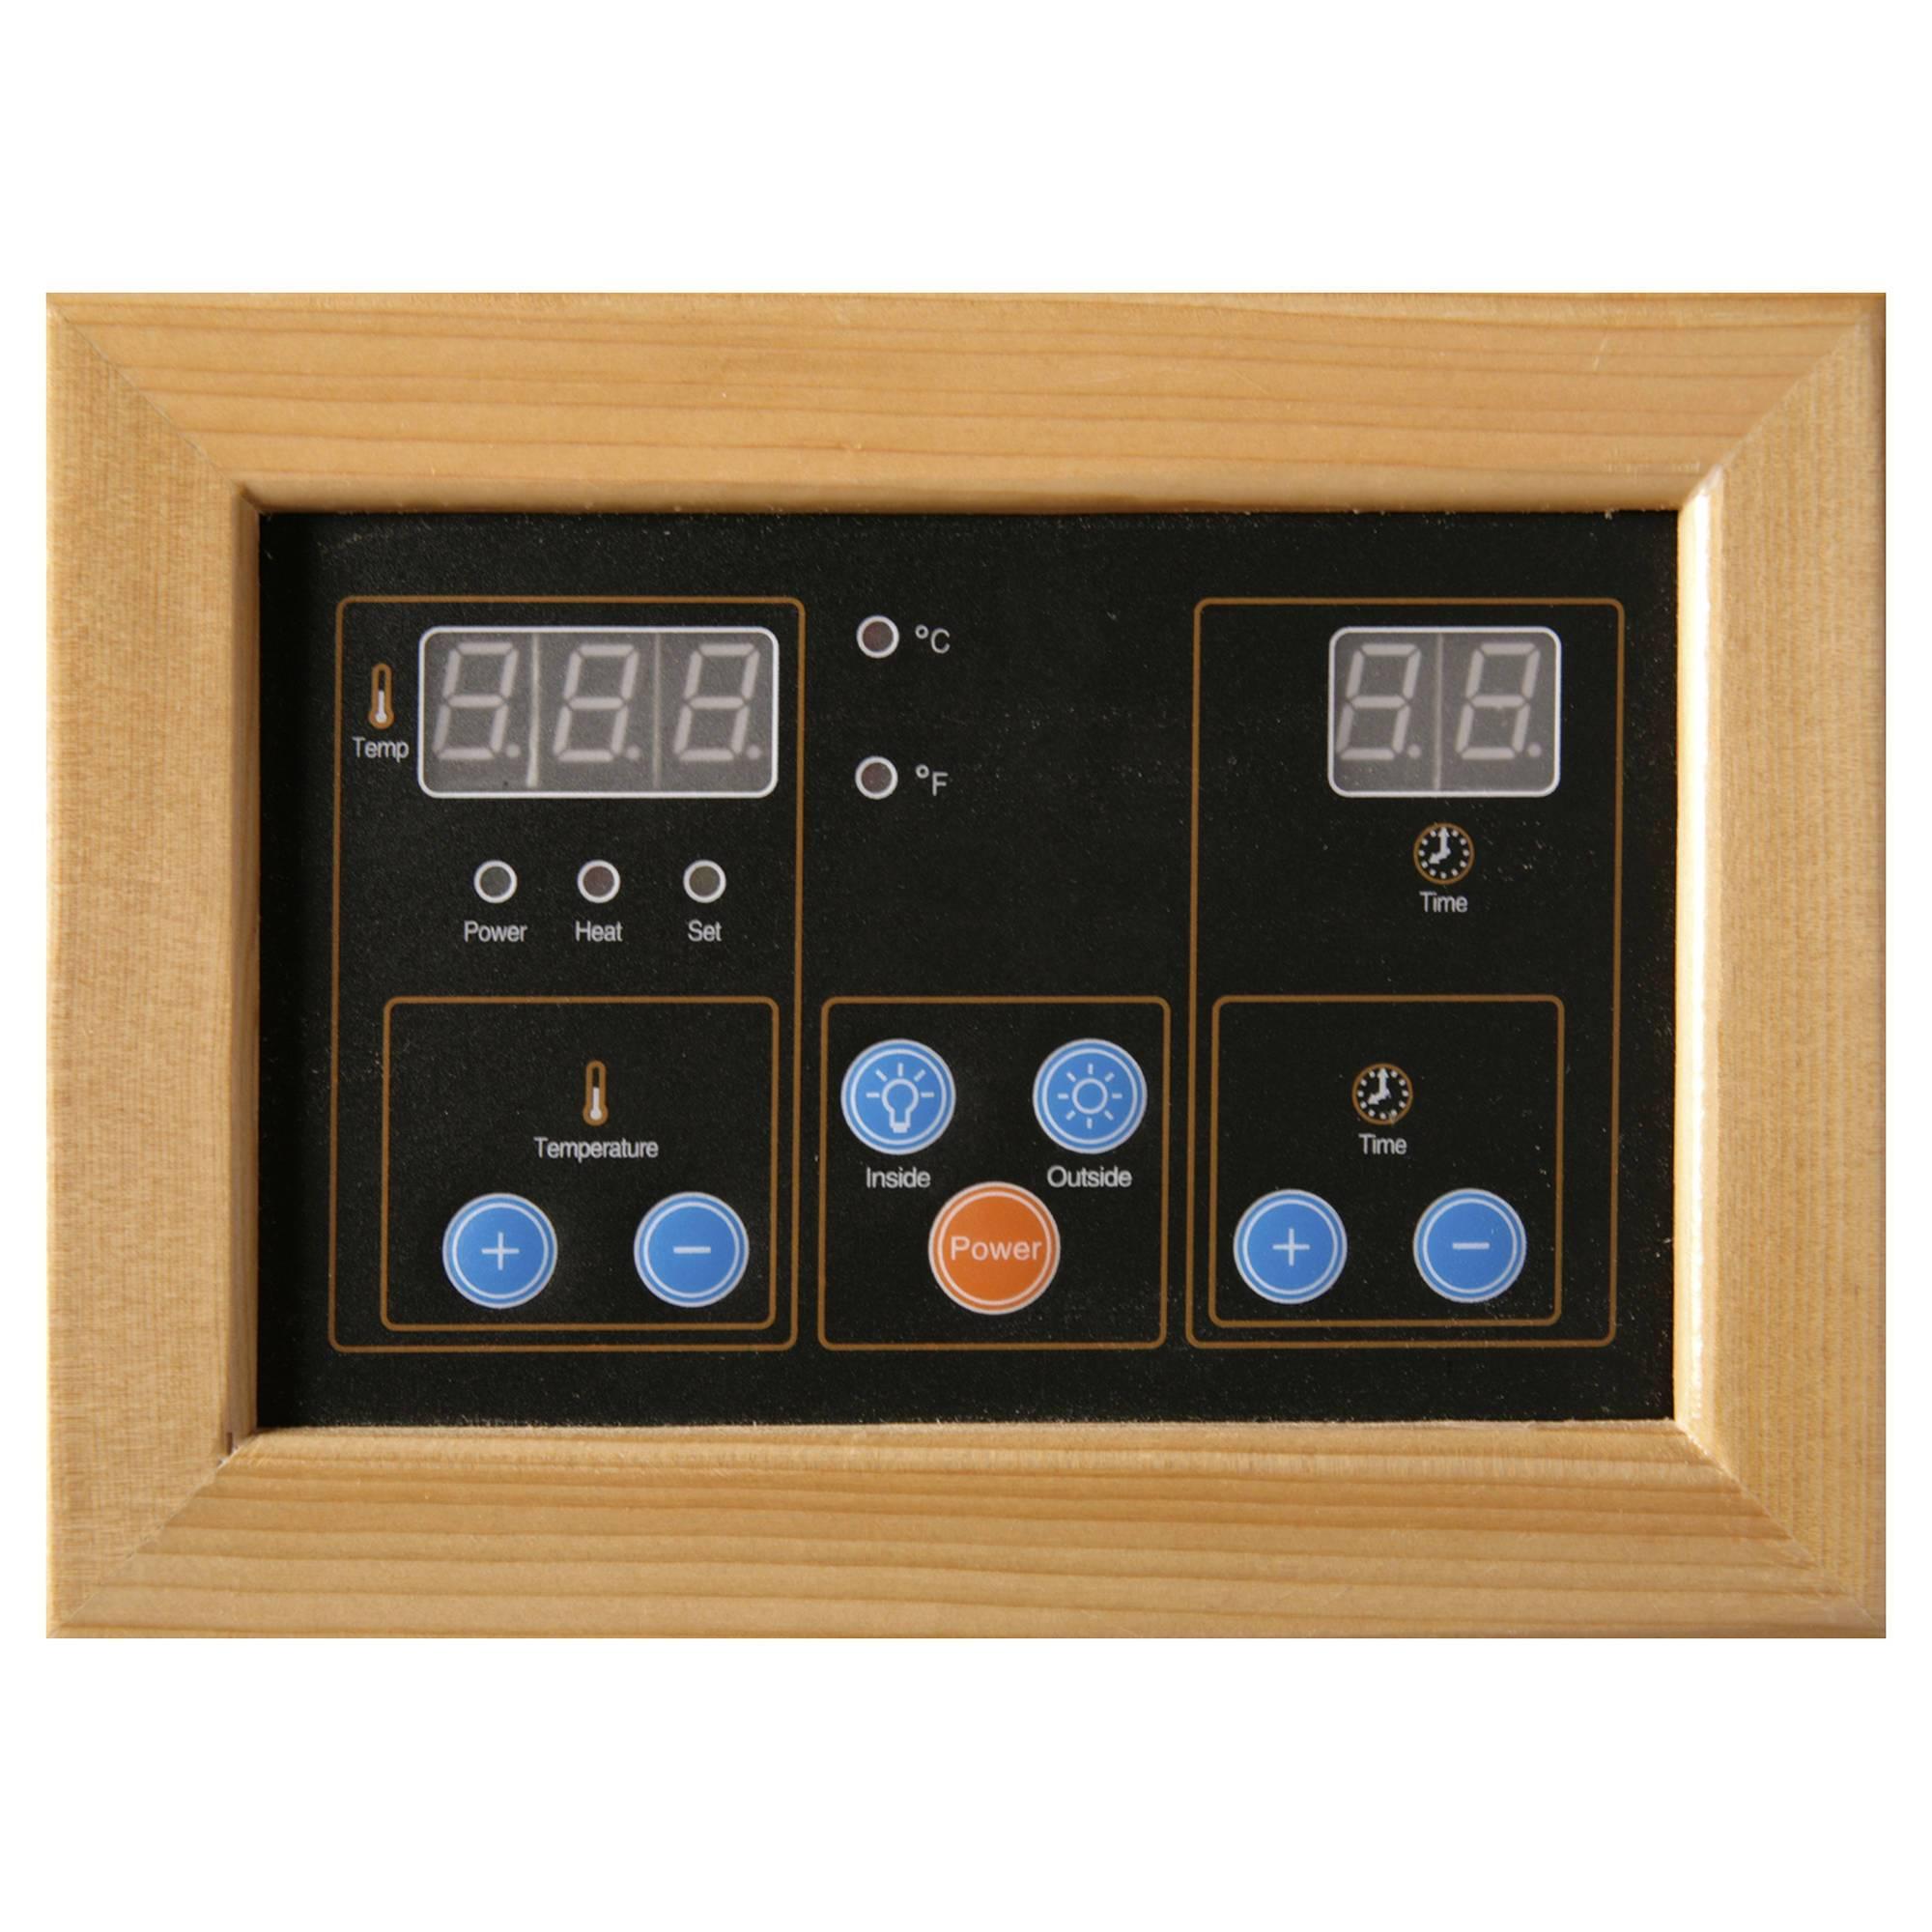 heatwave-sa2400-1-pearon-sauna-hemlock-controls